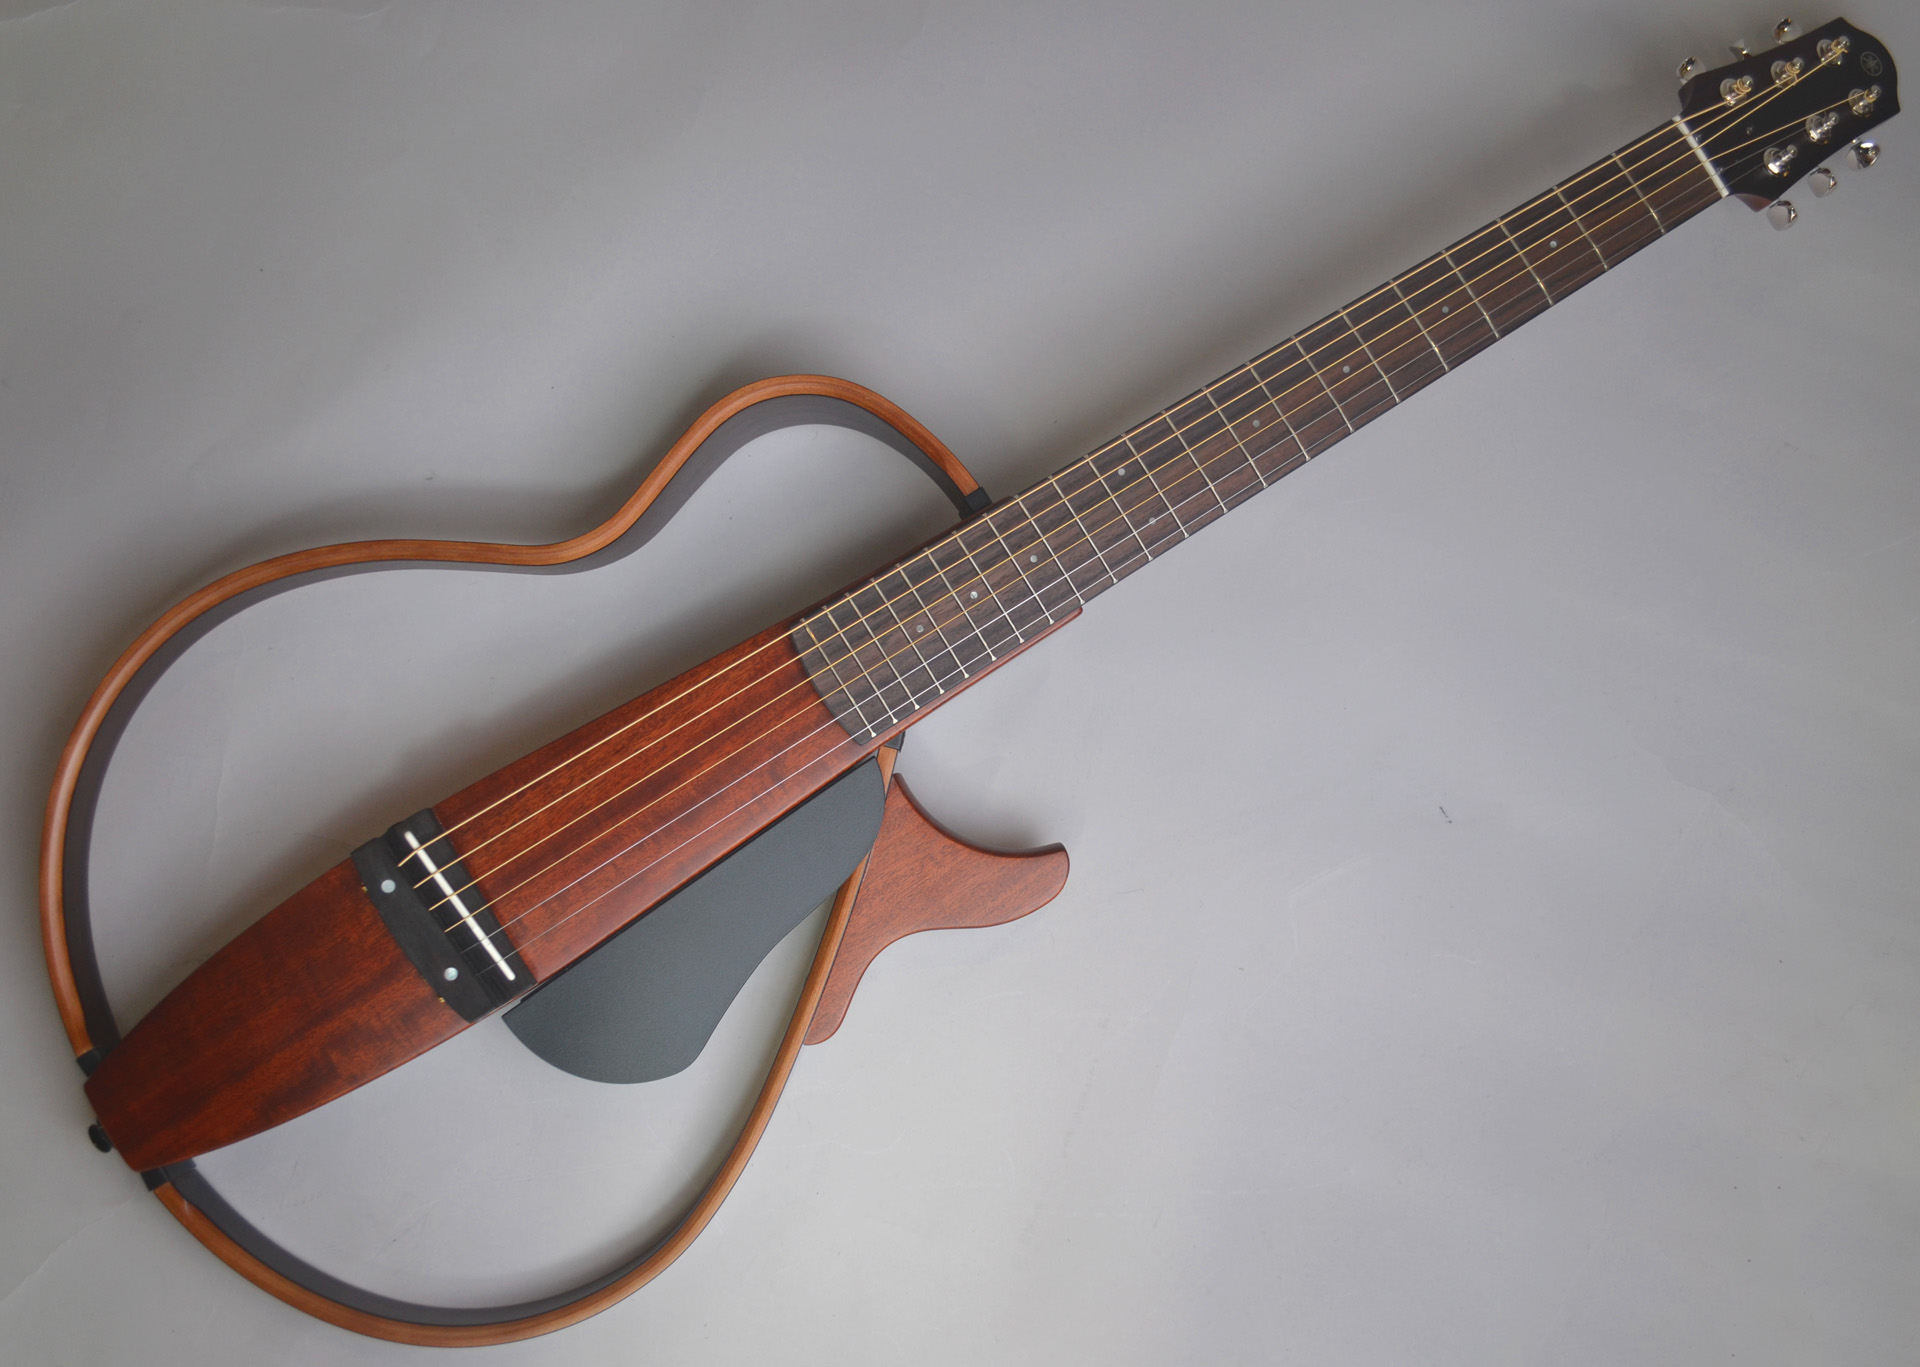 SLG200S Sirent Guitar サイレントギター